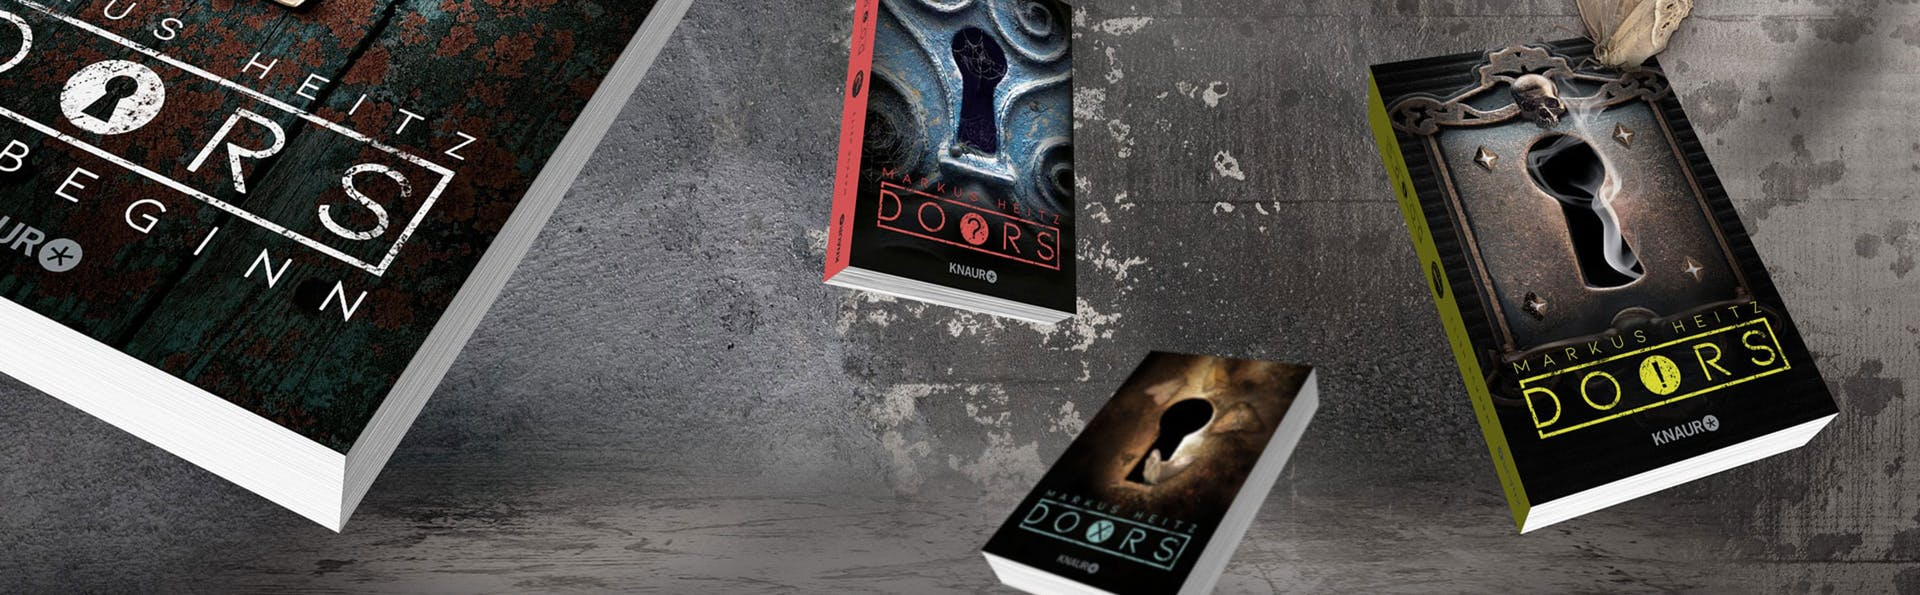 Droemer Knaur Doors Website